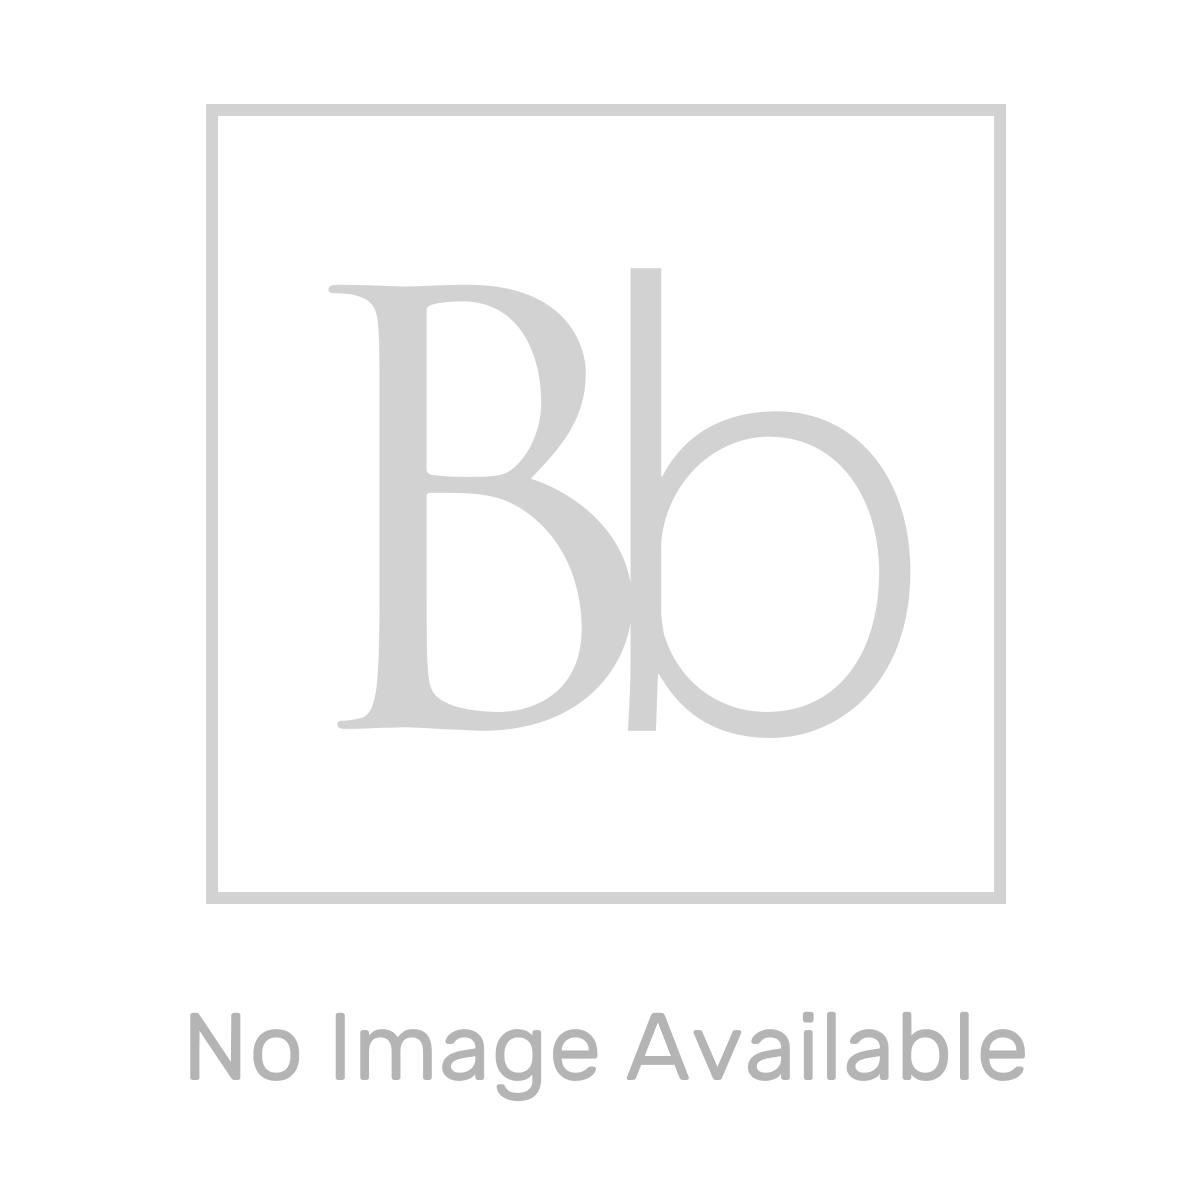 RAK Resort Wall Hung Hidden Fixation Toilet with Sandwich Soft Close Seat